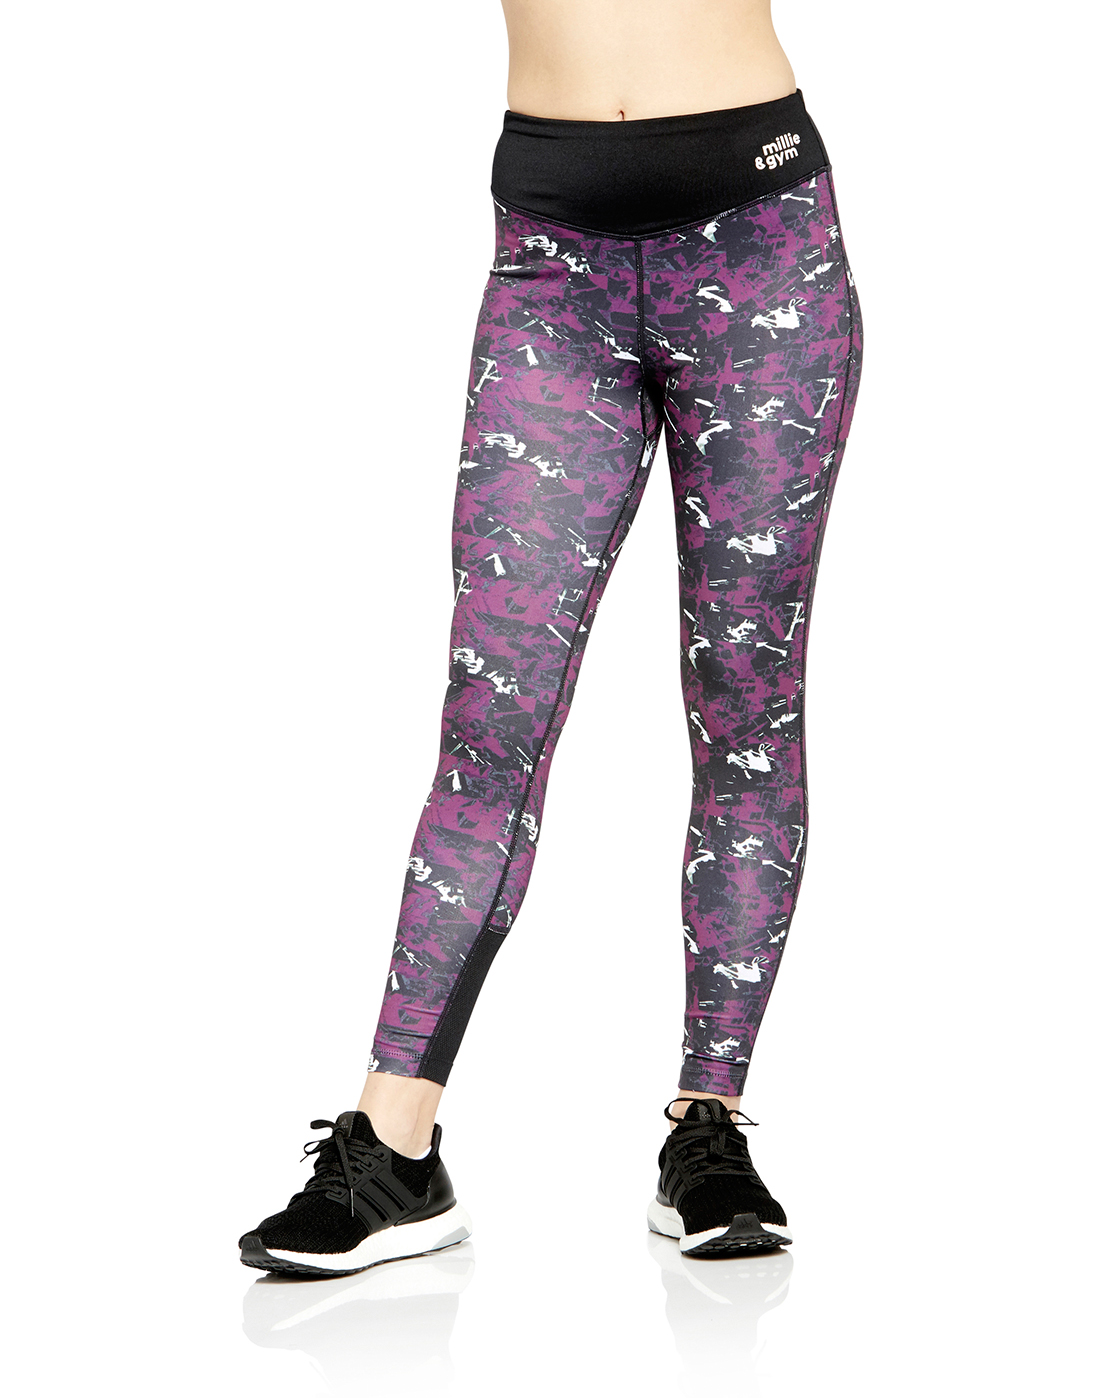 1bc0b31a78255 millie & gym Womens Printed Legging | Life Style Sports